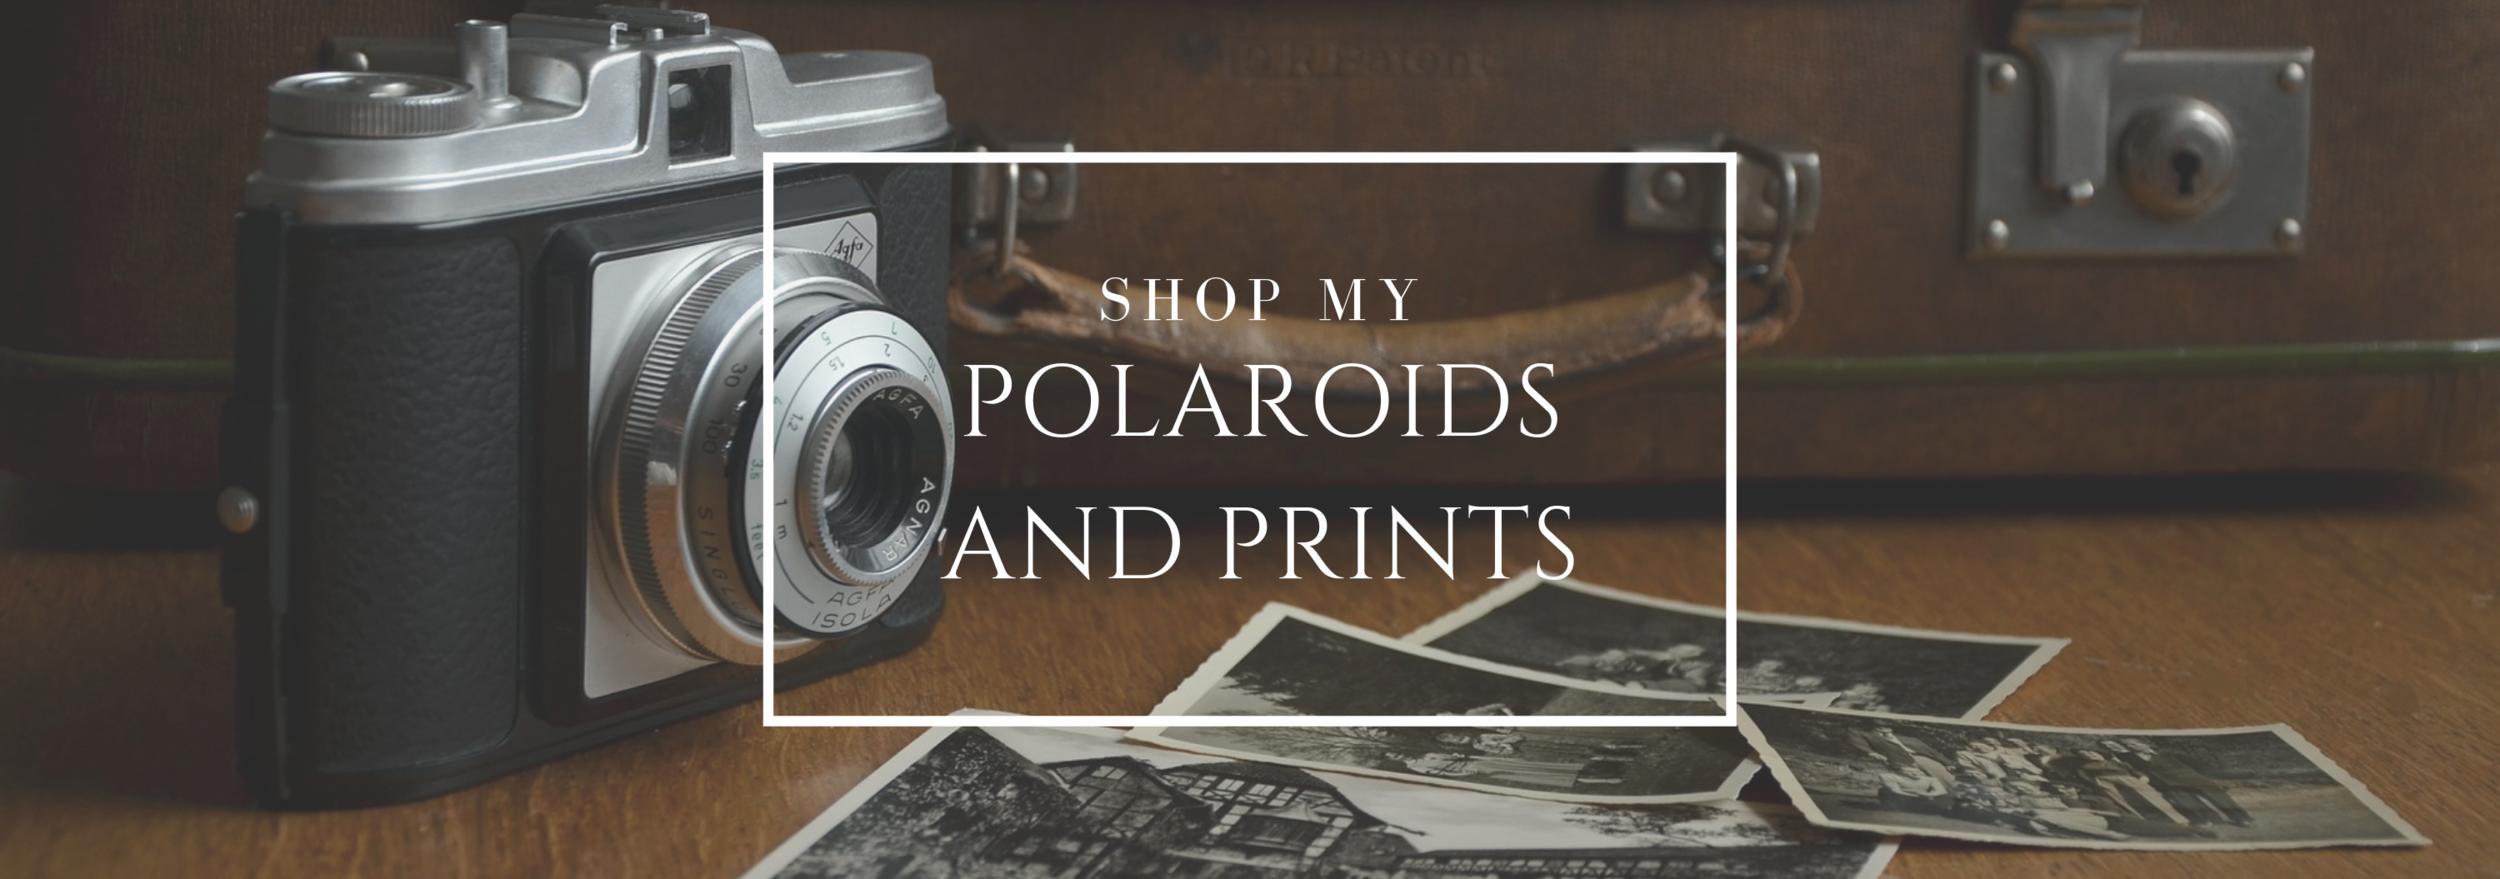 Shop Polaroids and Prints Banner.png